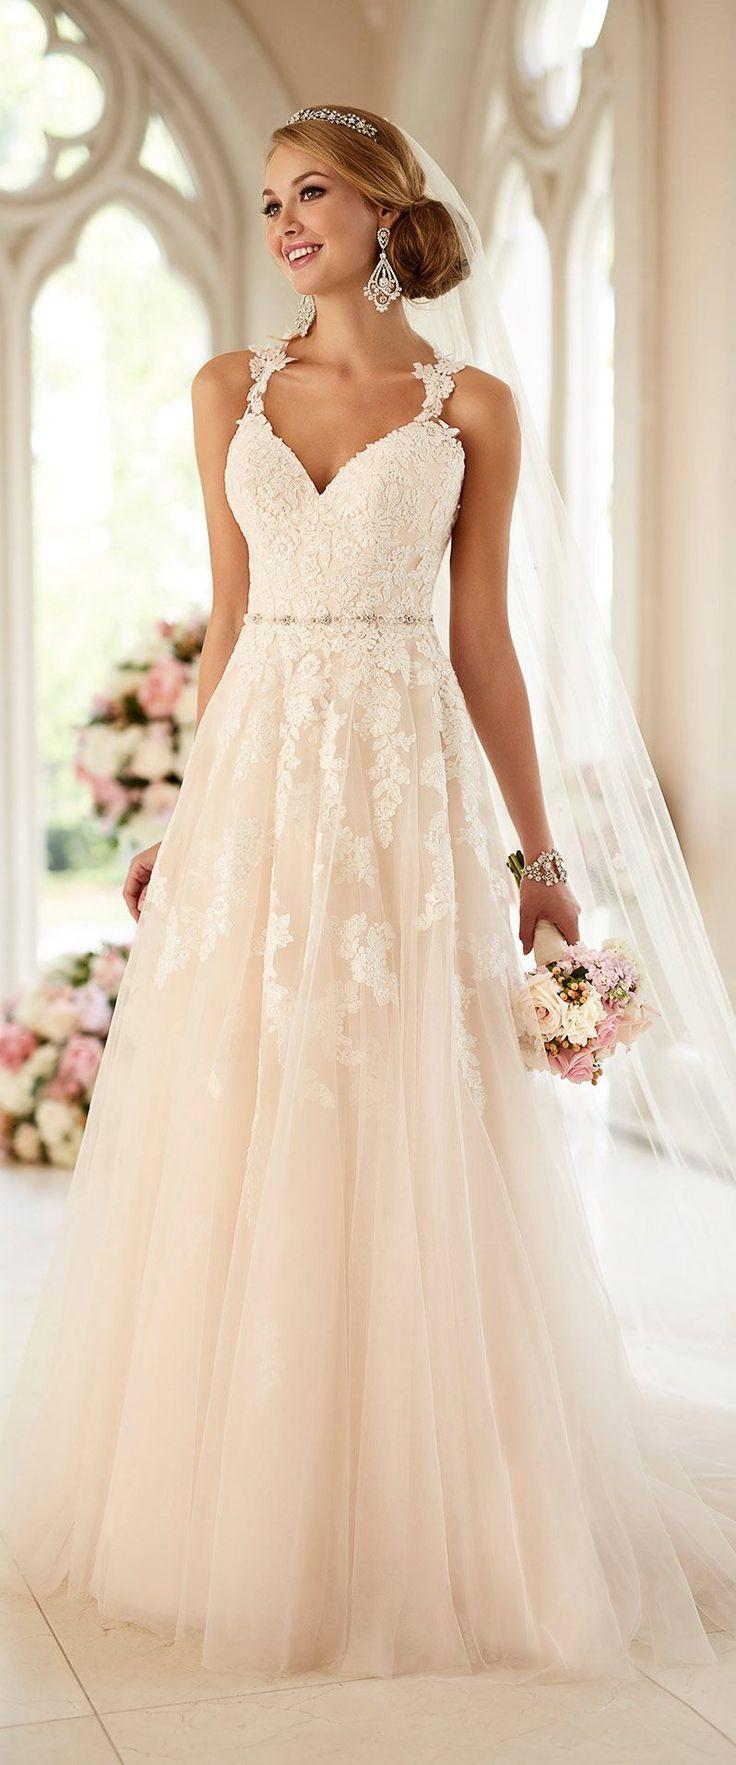 blush wedding dresses best wedding dress cool wedding dresses lace best photos